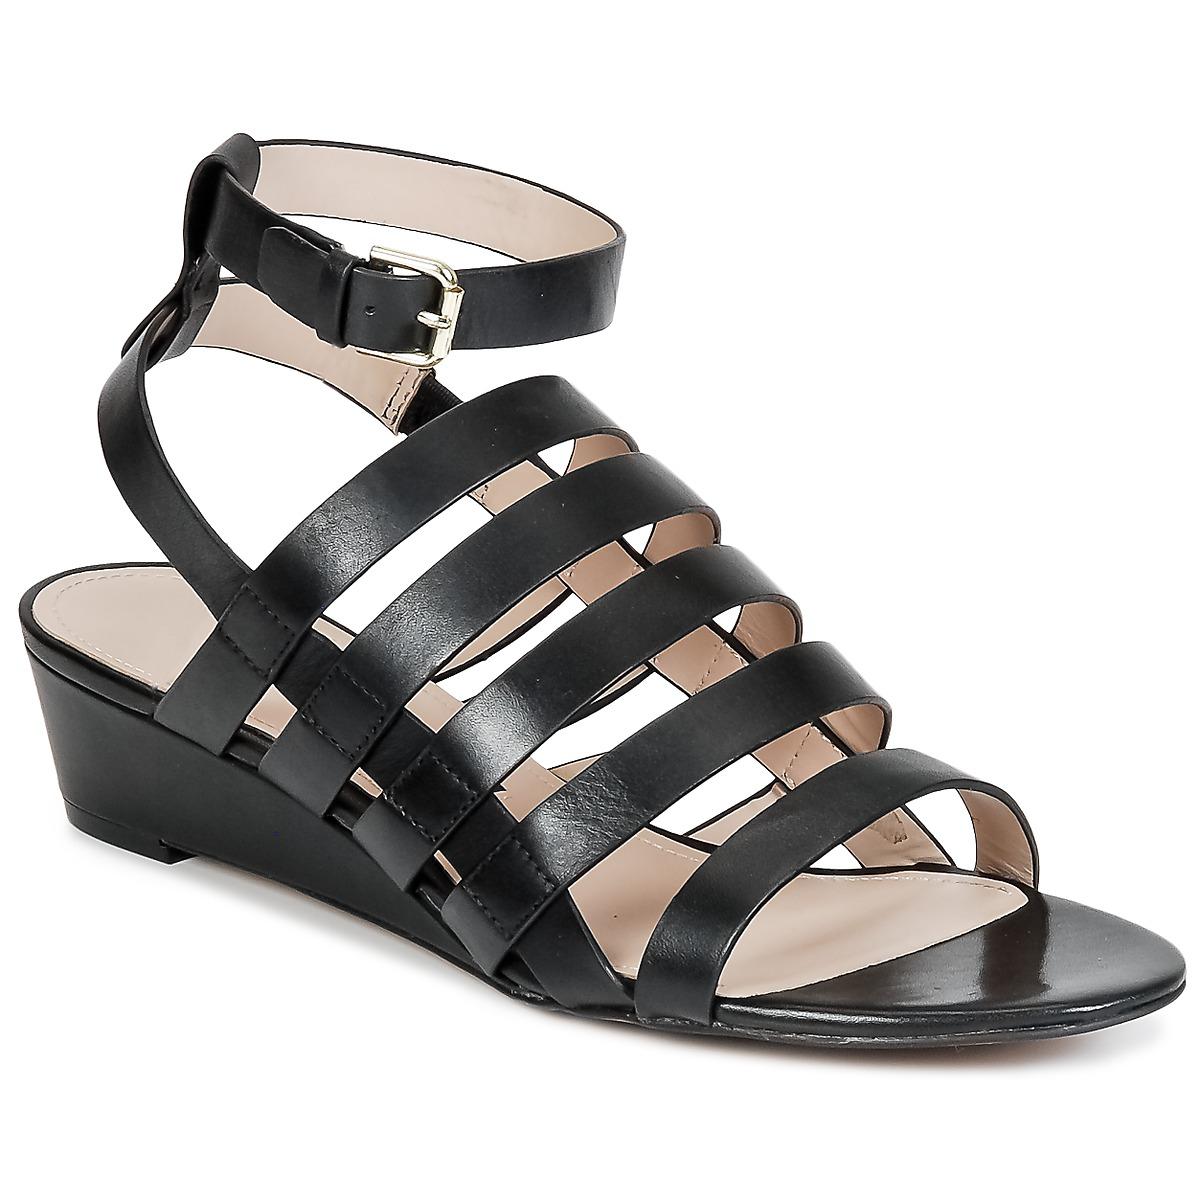 Sandale French Connection WINONA Noir